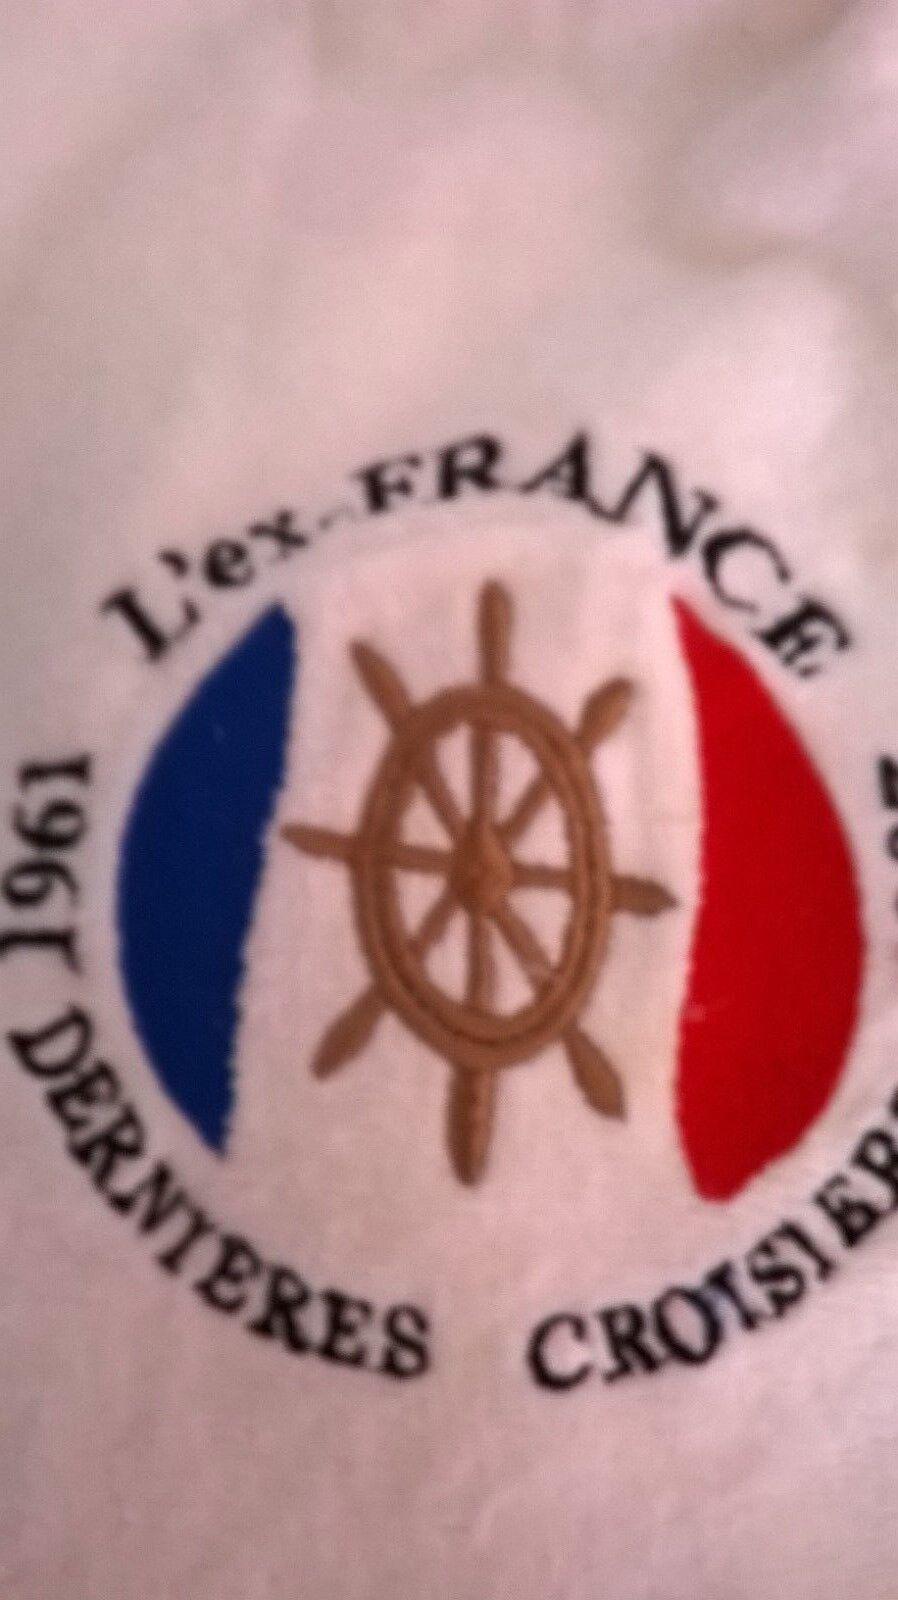 LE FRANCE SAC DE PLACE +SERVIETTE DE BAIN BAIN BAIN EPONGE WeißHE NEUF 892131